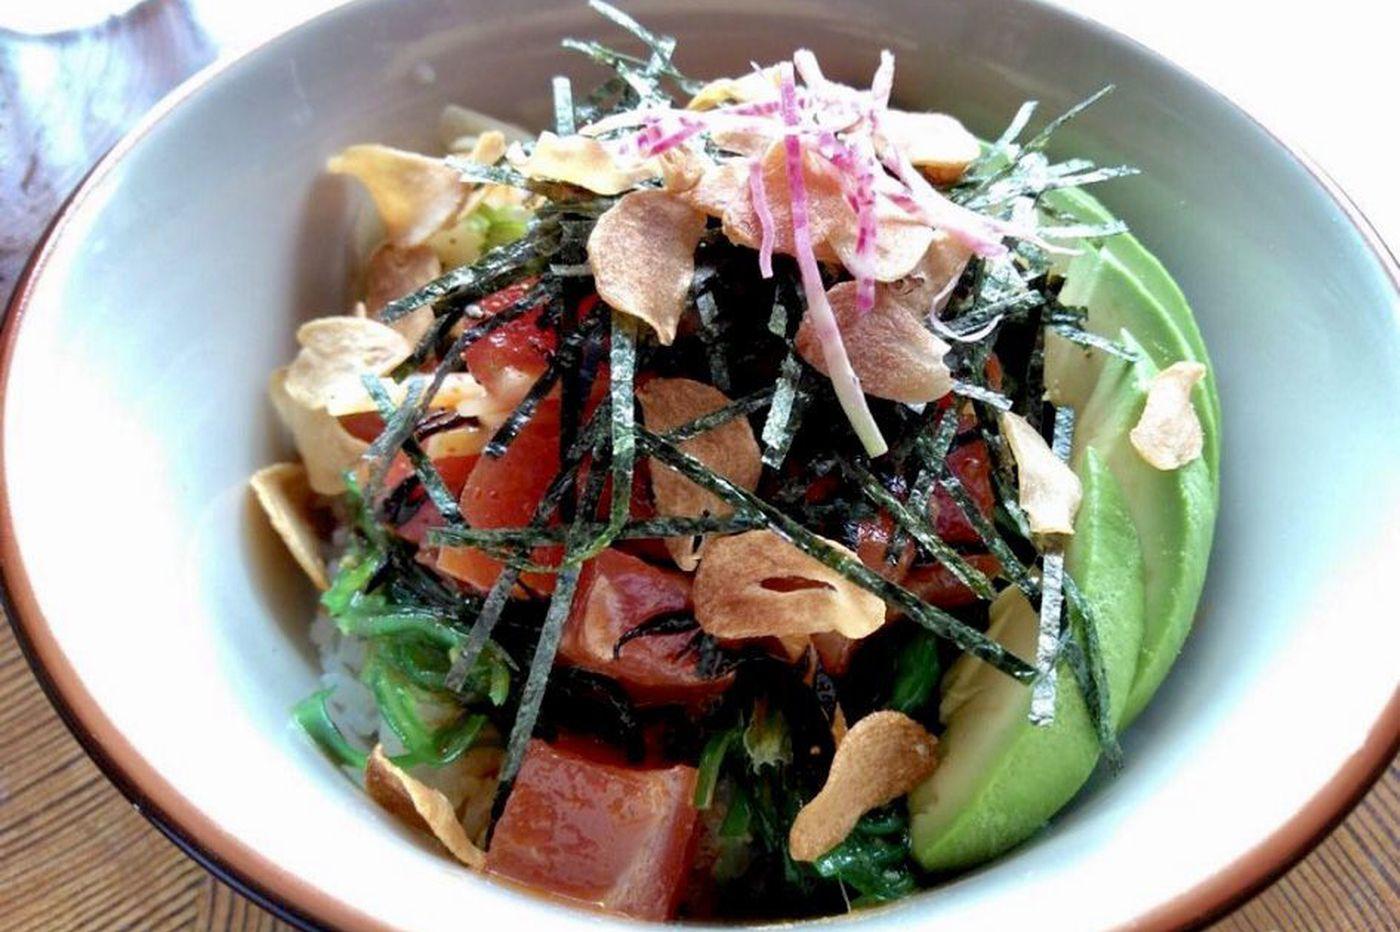 Nom Nom Bowl brings sushi and ramen together in Center City